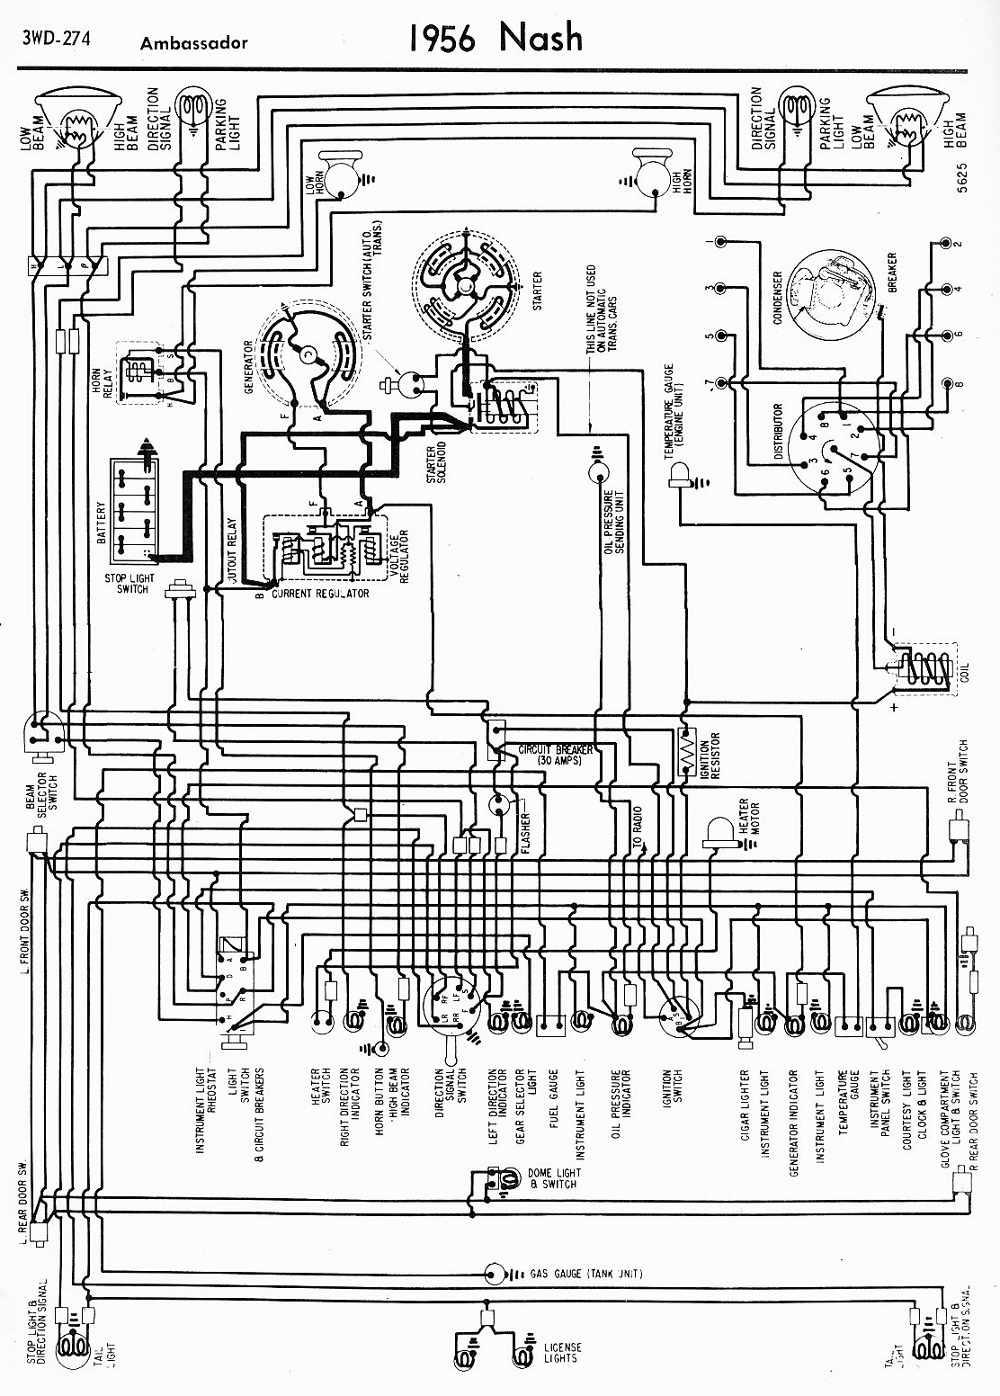 Nash  Car Manuals, Wiring Diagrams PDF & Fault Codes